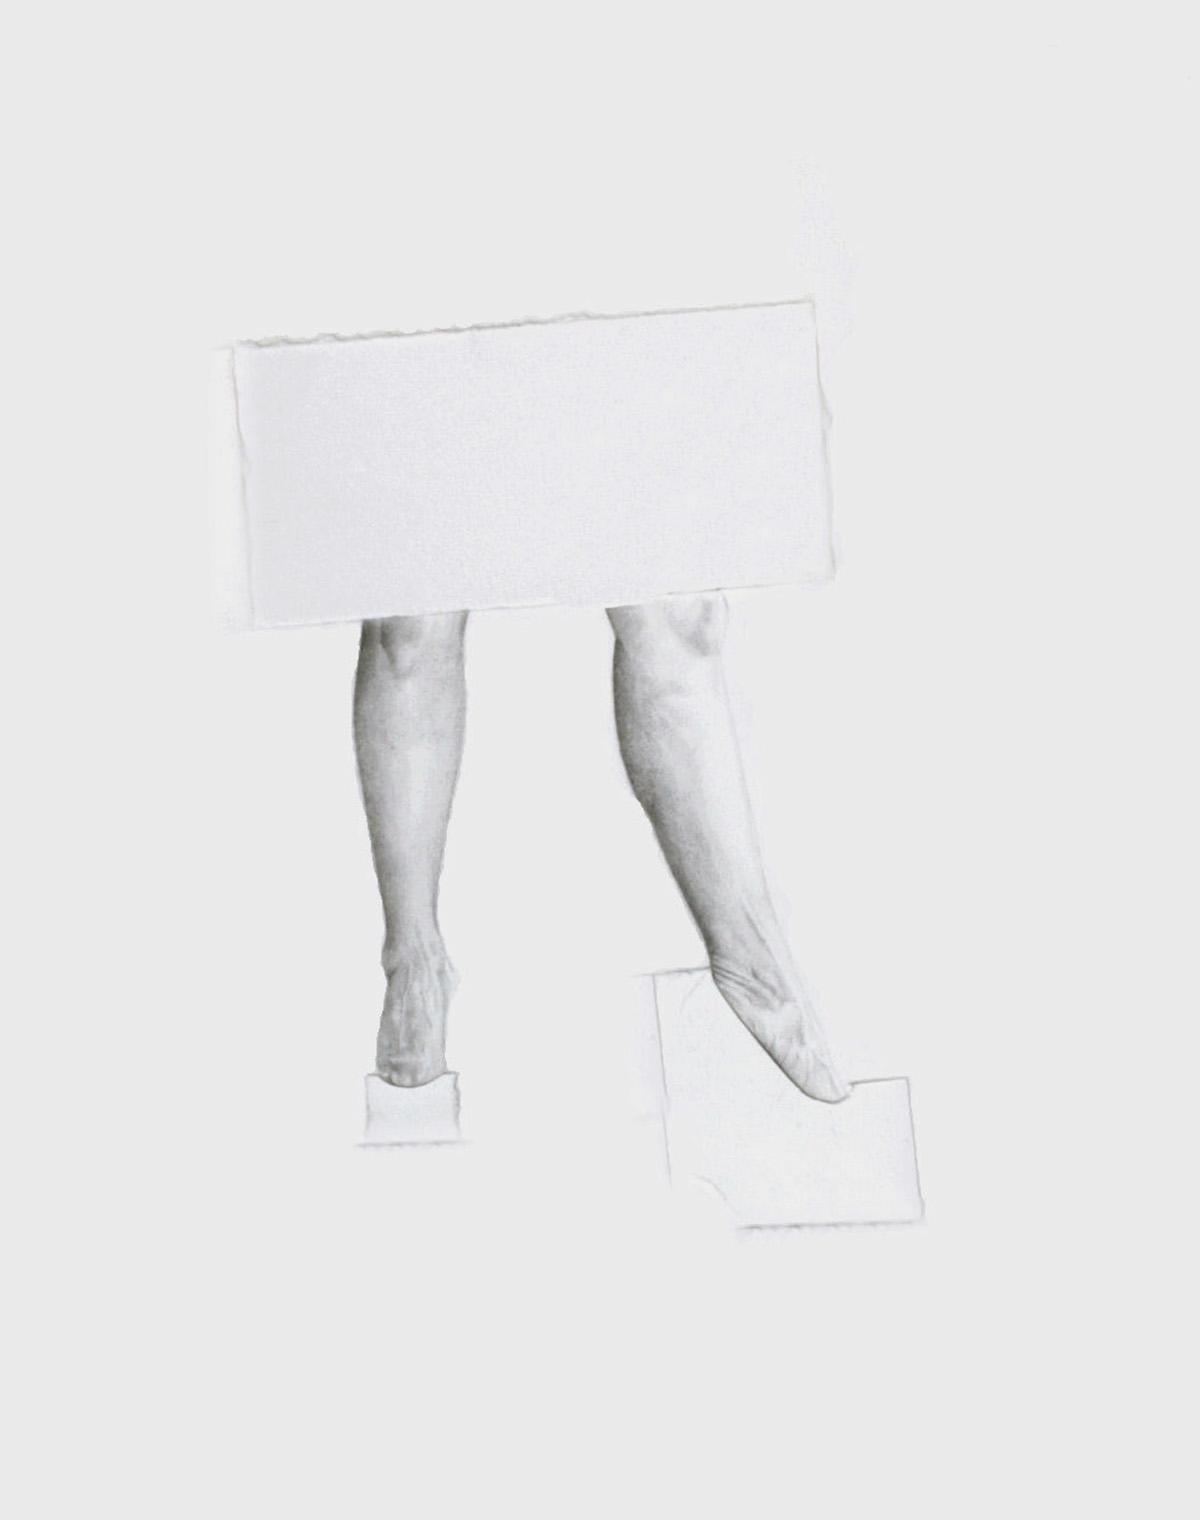 "Untitled, 18"" x 24"", 2010"